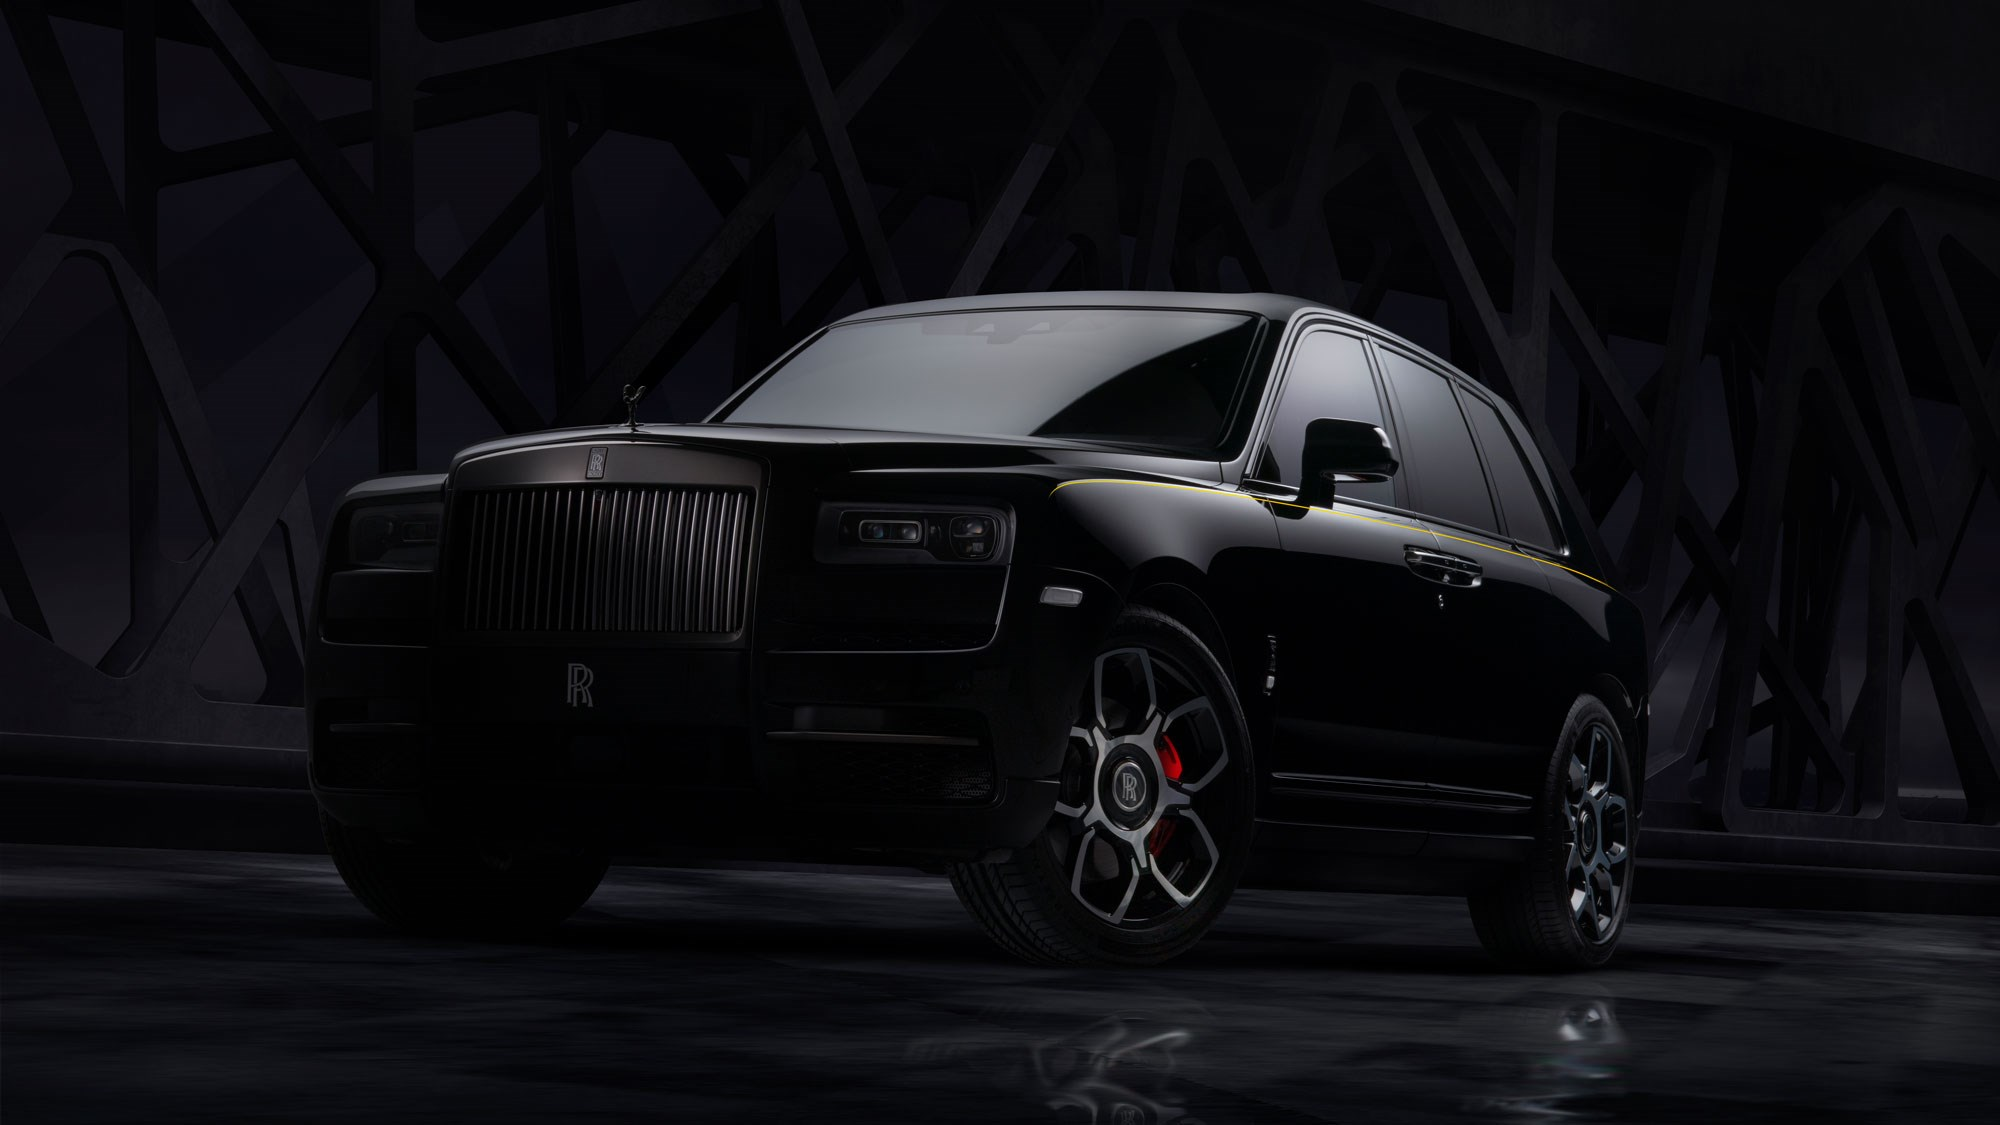 Rolls-Royce Cullinan gets the Black Badge